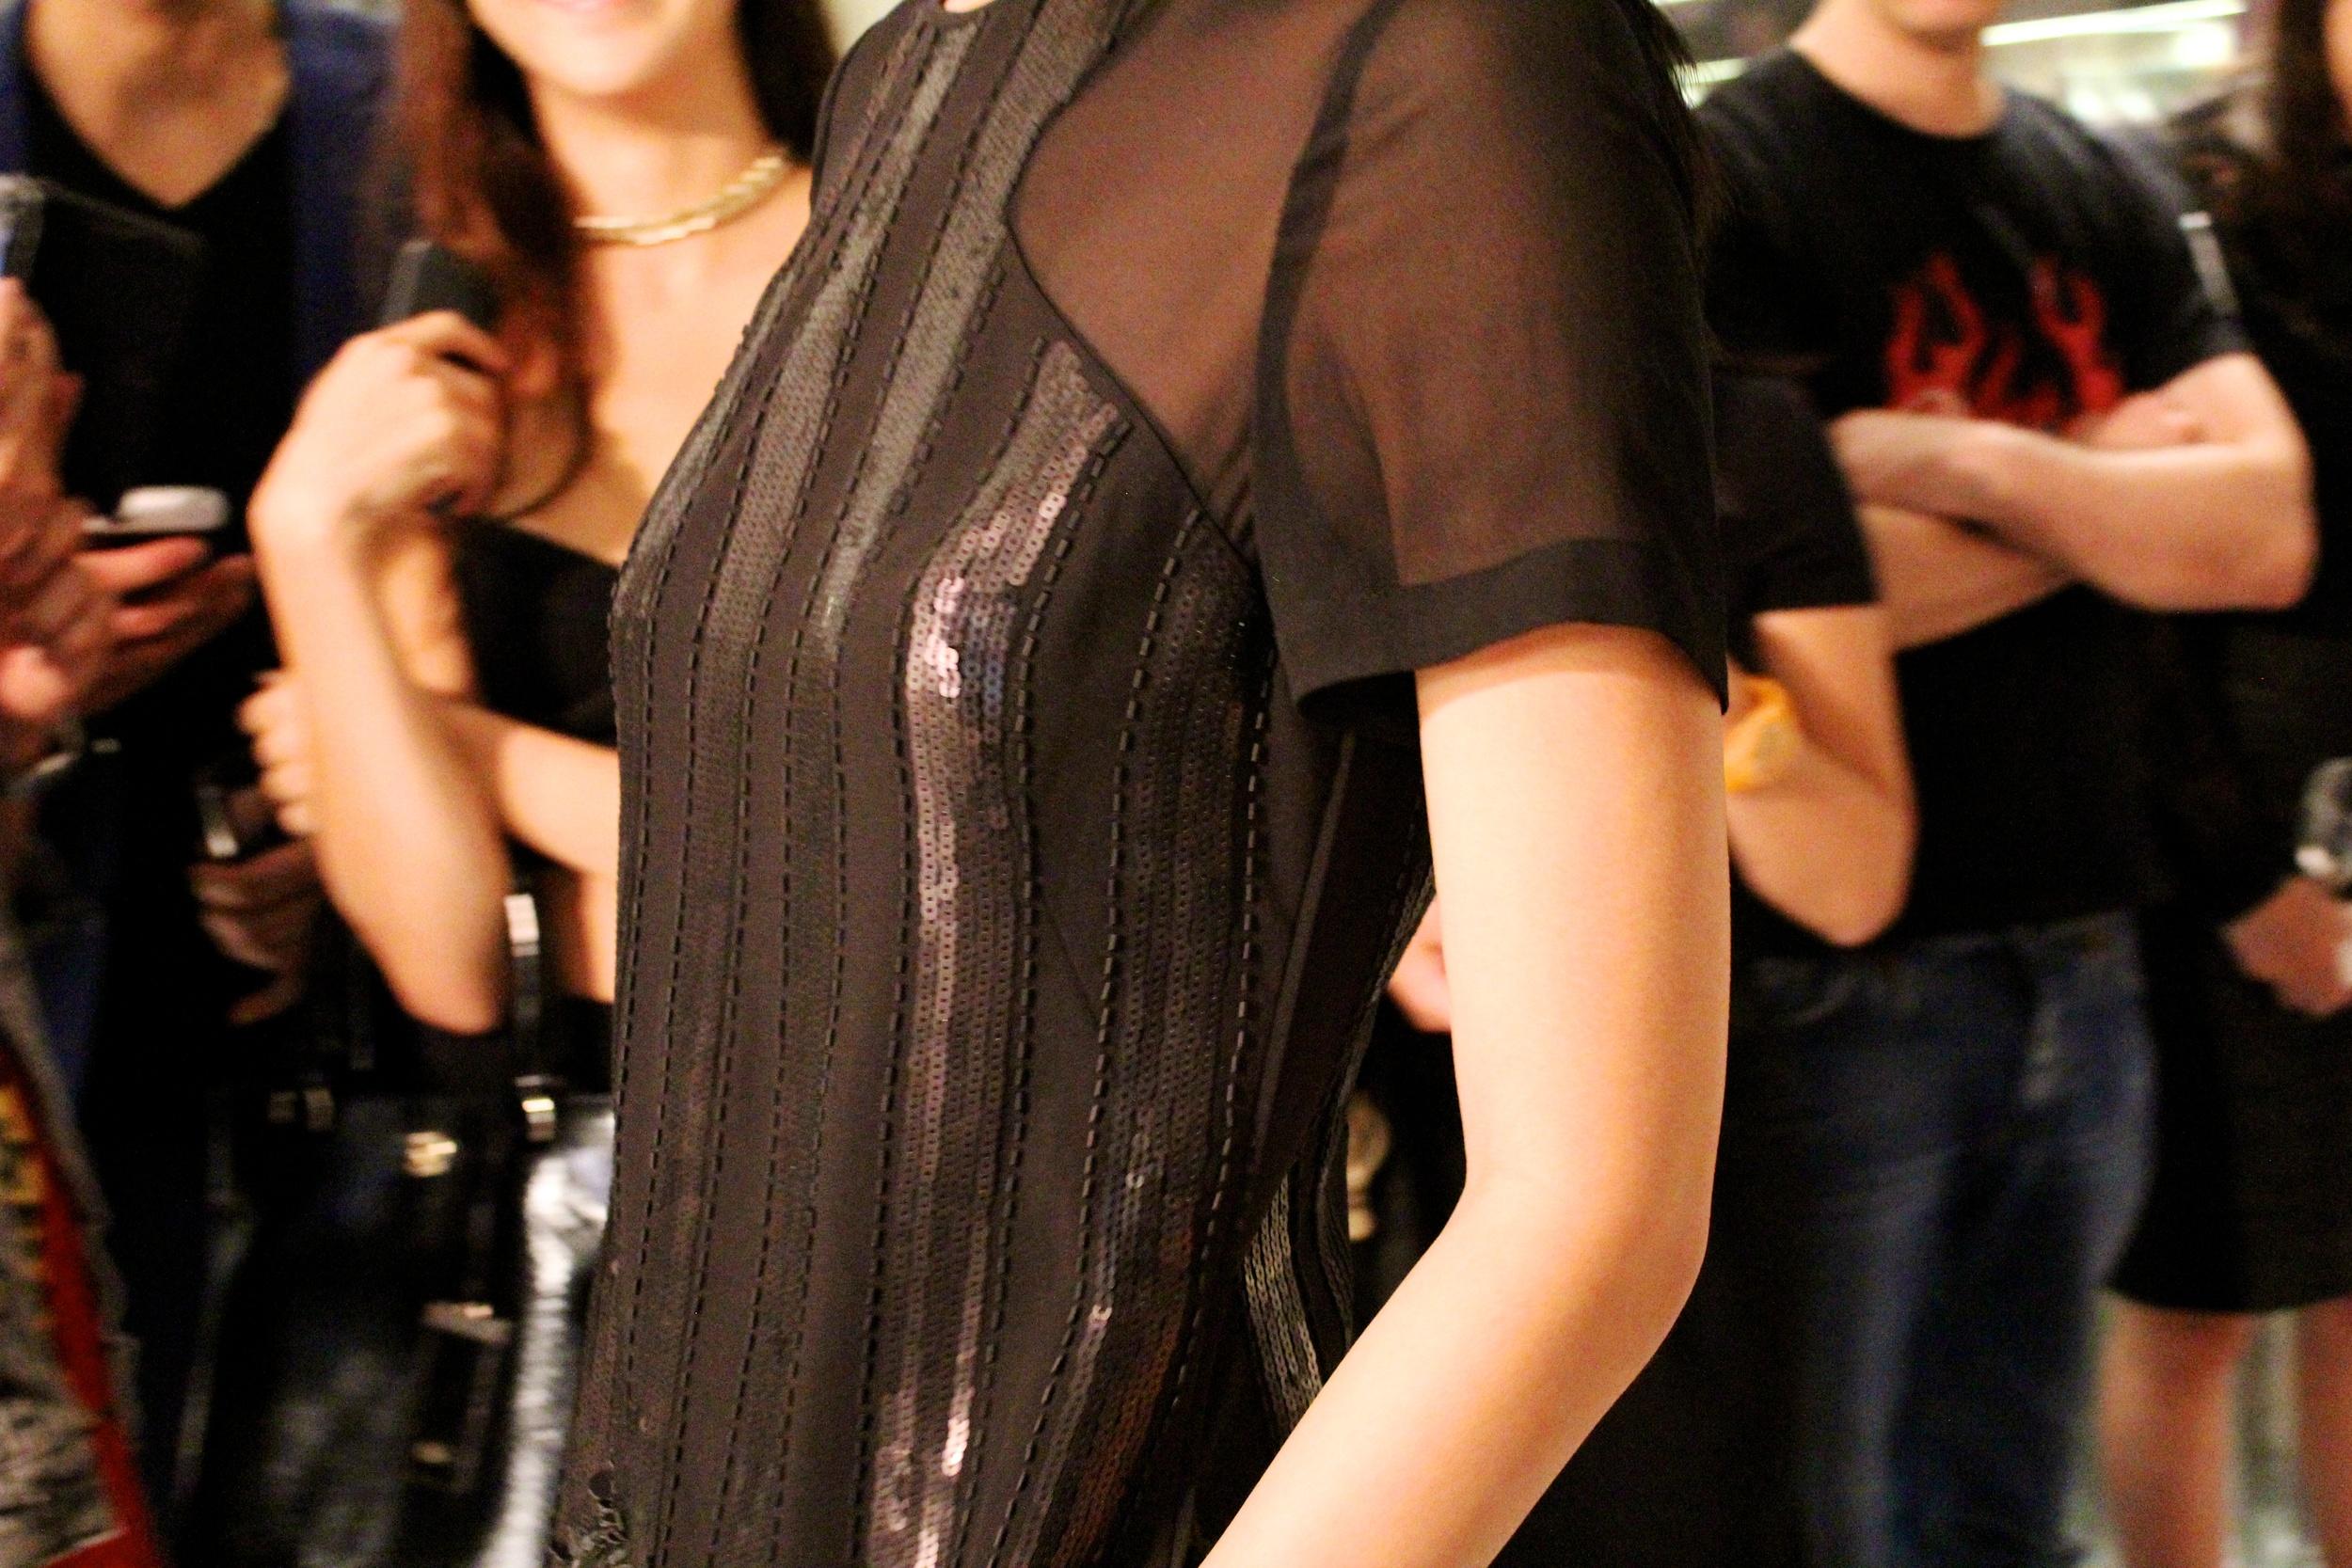 Dress:   Sequin stripe dress